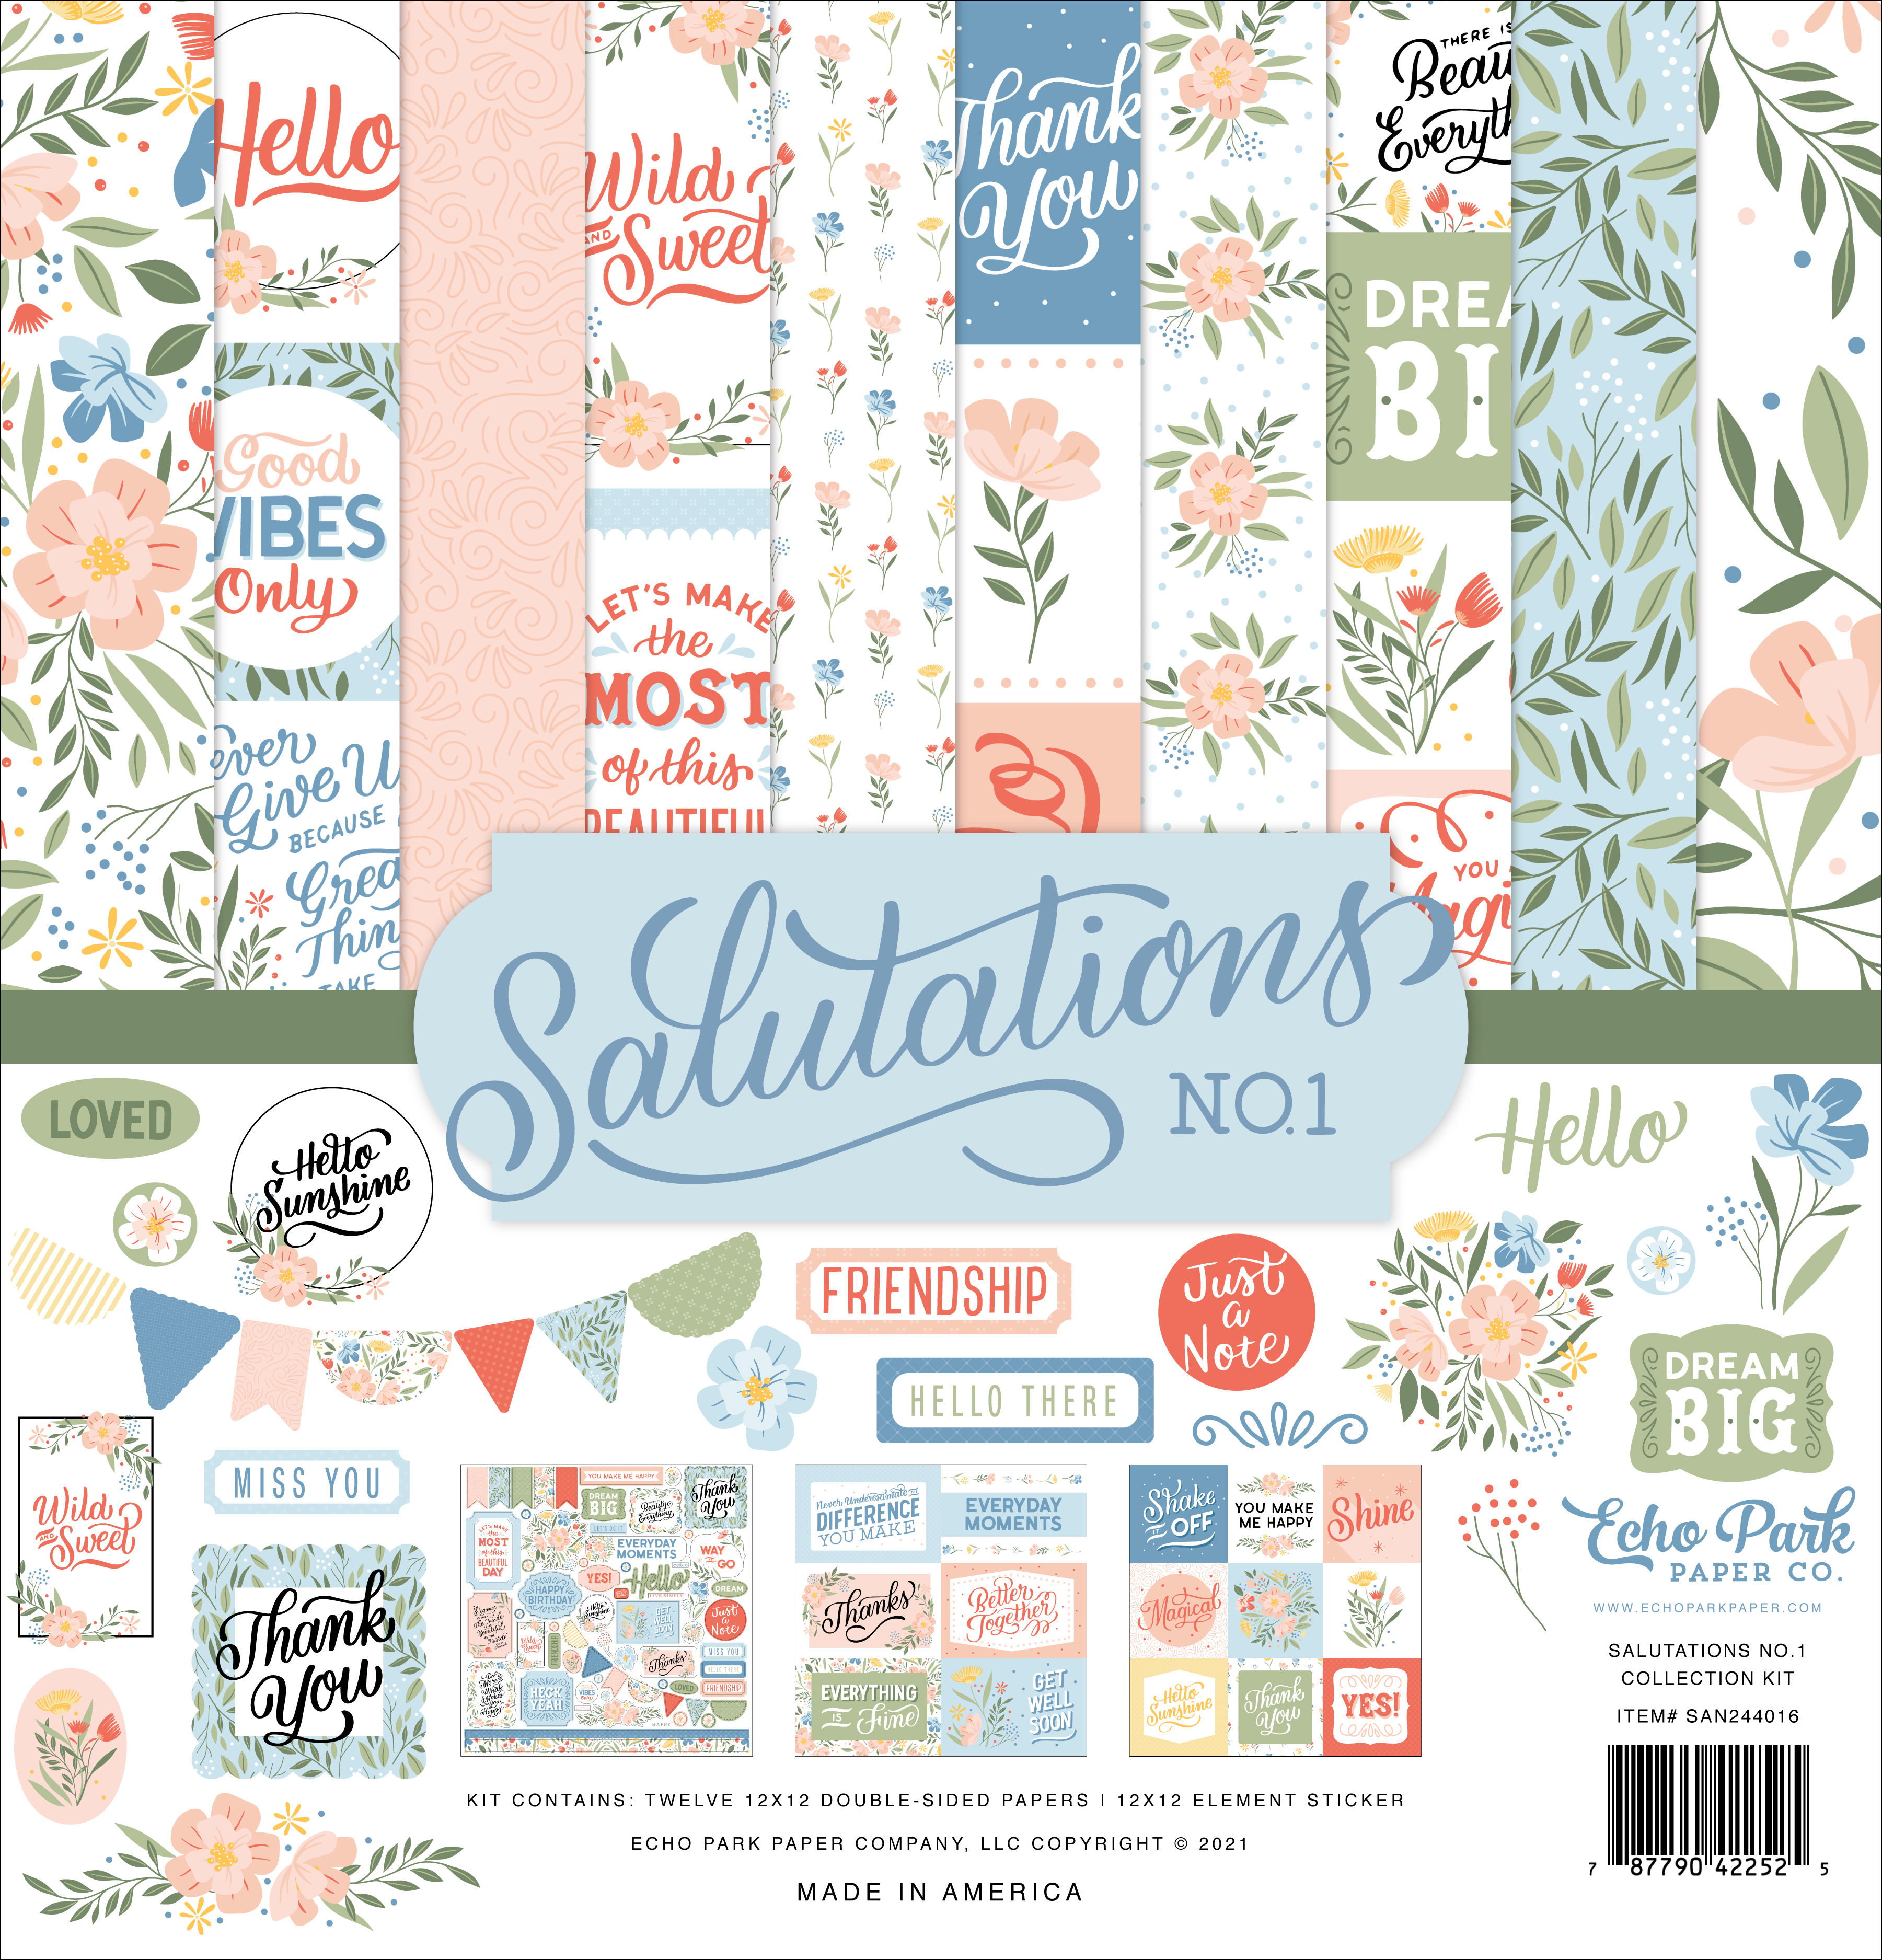 Salutations No. 1 Collection Kit